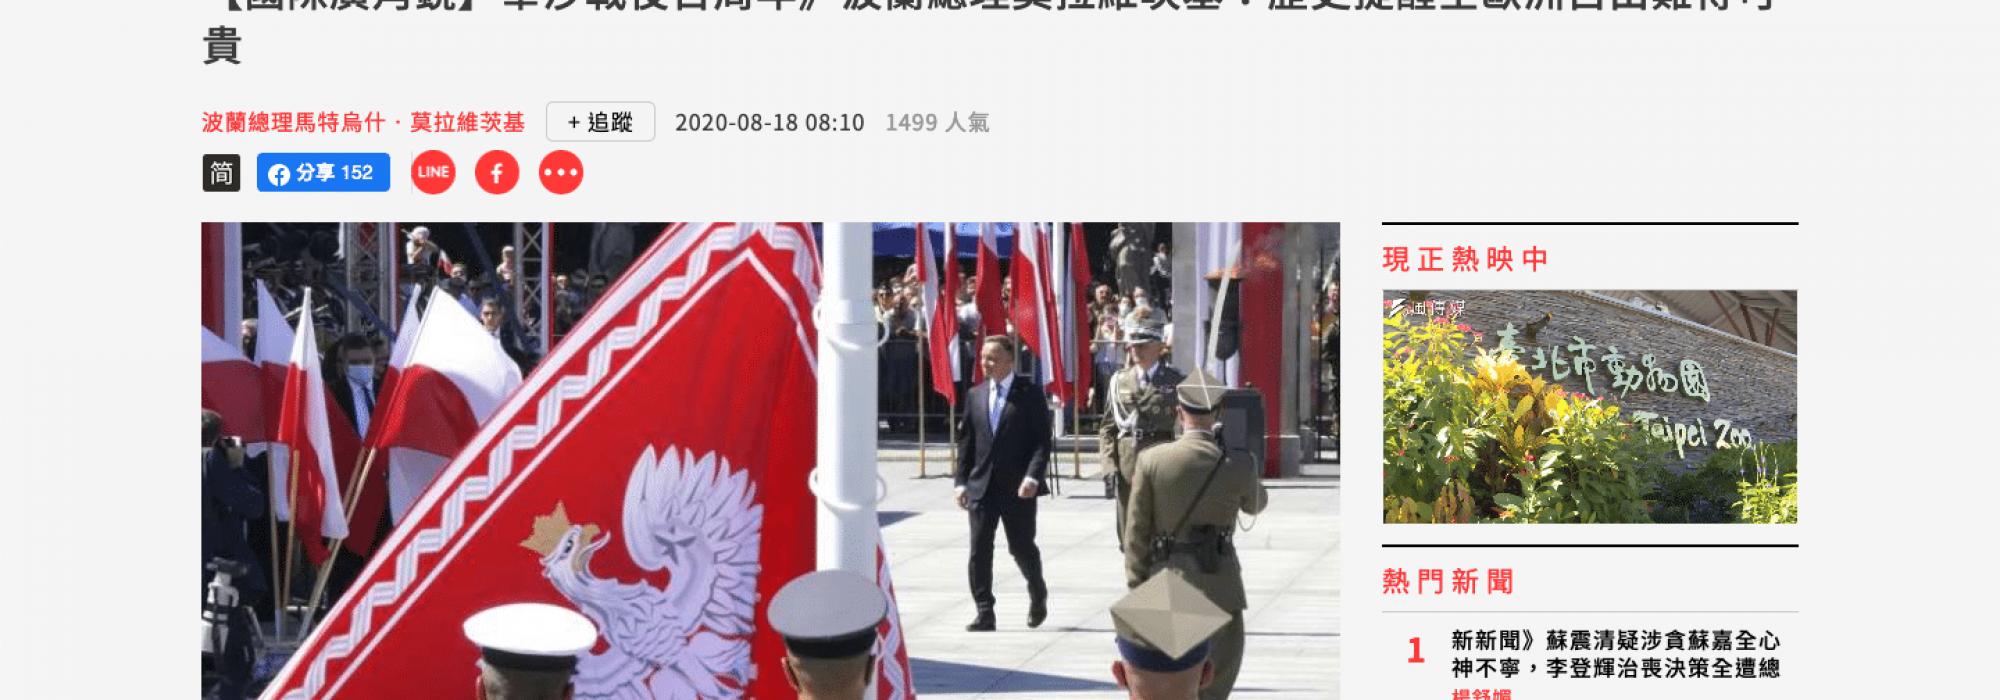 Zrzut ekranu 2020-08-19 o 10.42.56